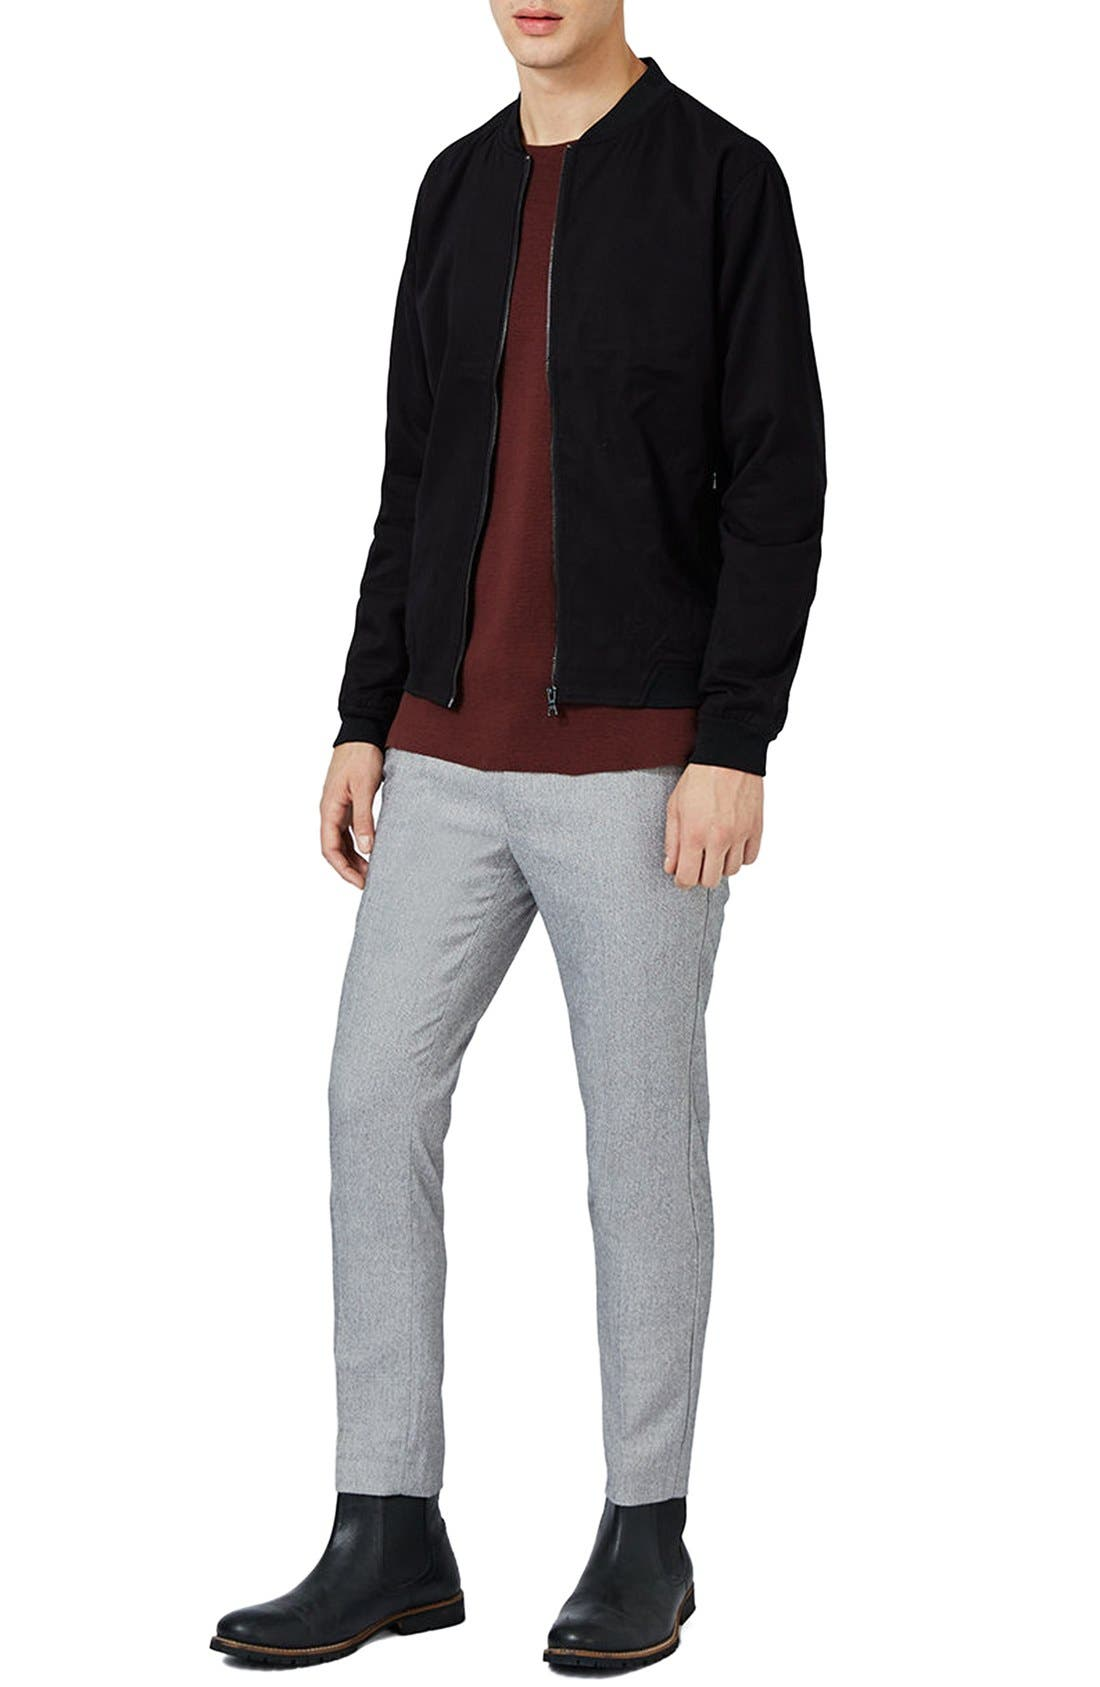 Cotton Bomber Jacket,                             Alternate thumbnail 2, color,                             Black